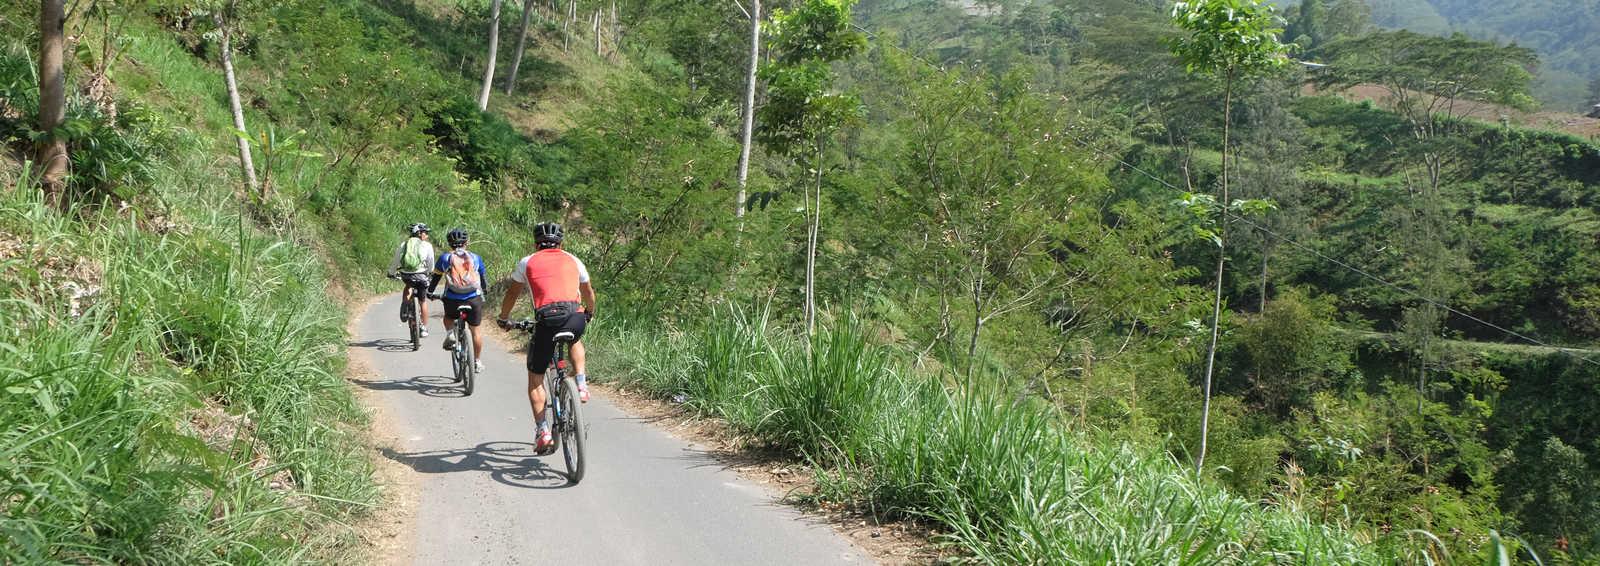 Cycling through Bali's mountainous interior